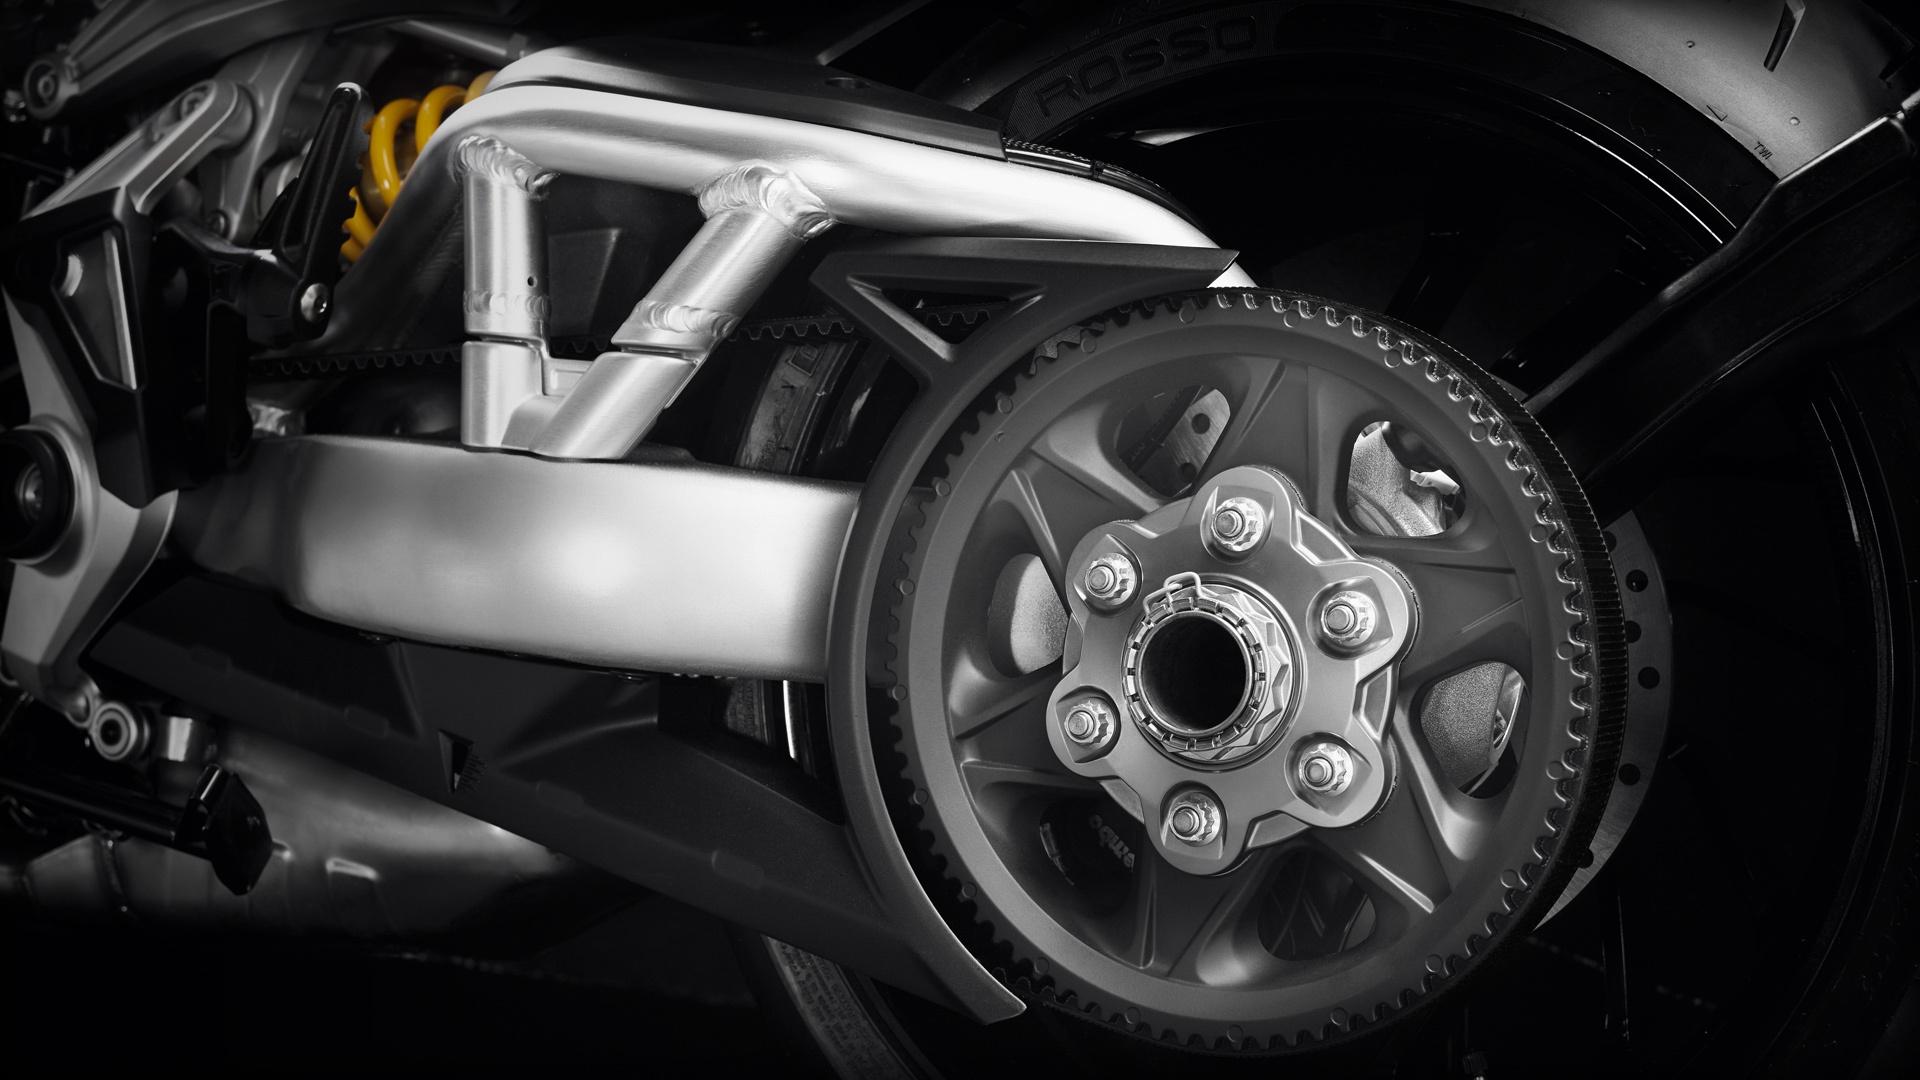 МОТОЦИКЛ DUCATI XDIAVEL ― Артмото - купить квадроцикл в украине и харькове, мотоцикл, снегоход, скутер, мопед, электромобиль